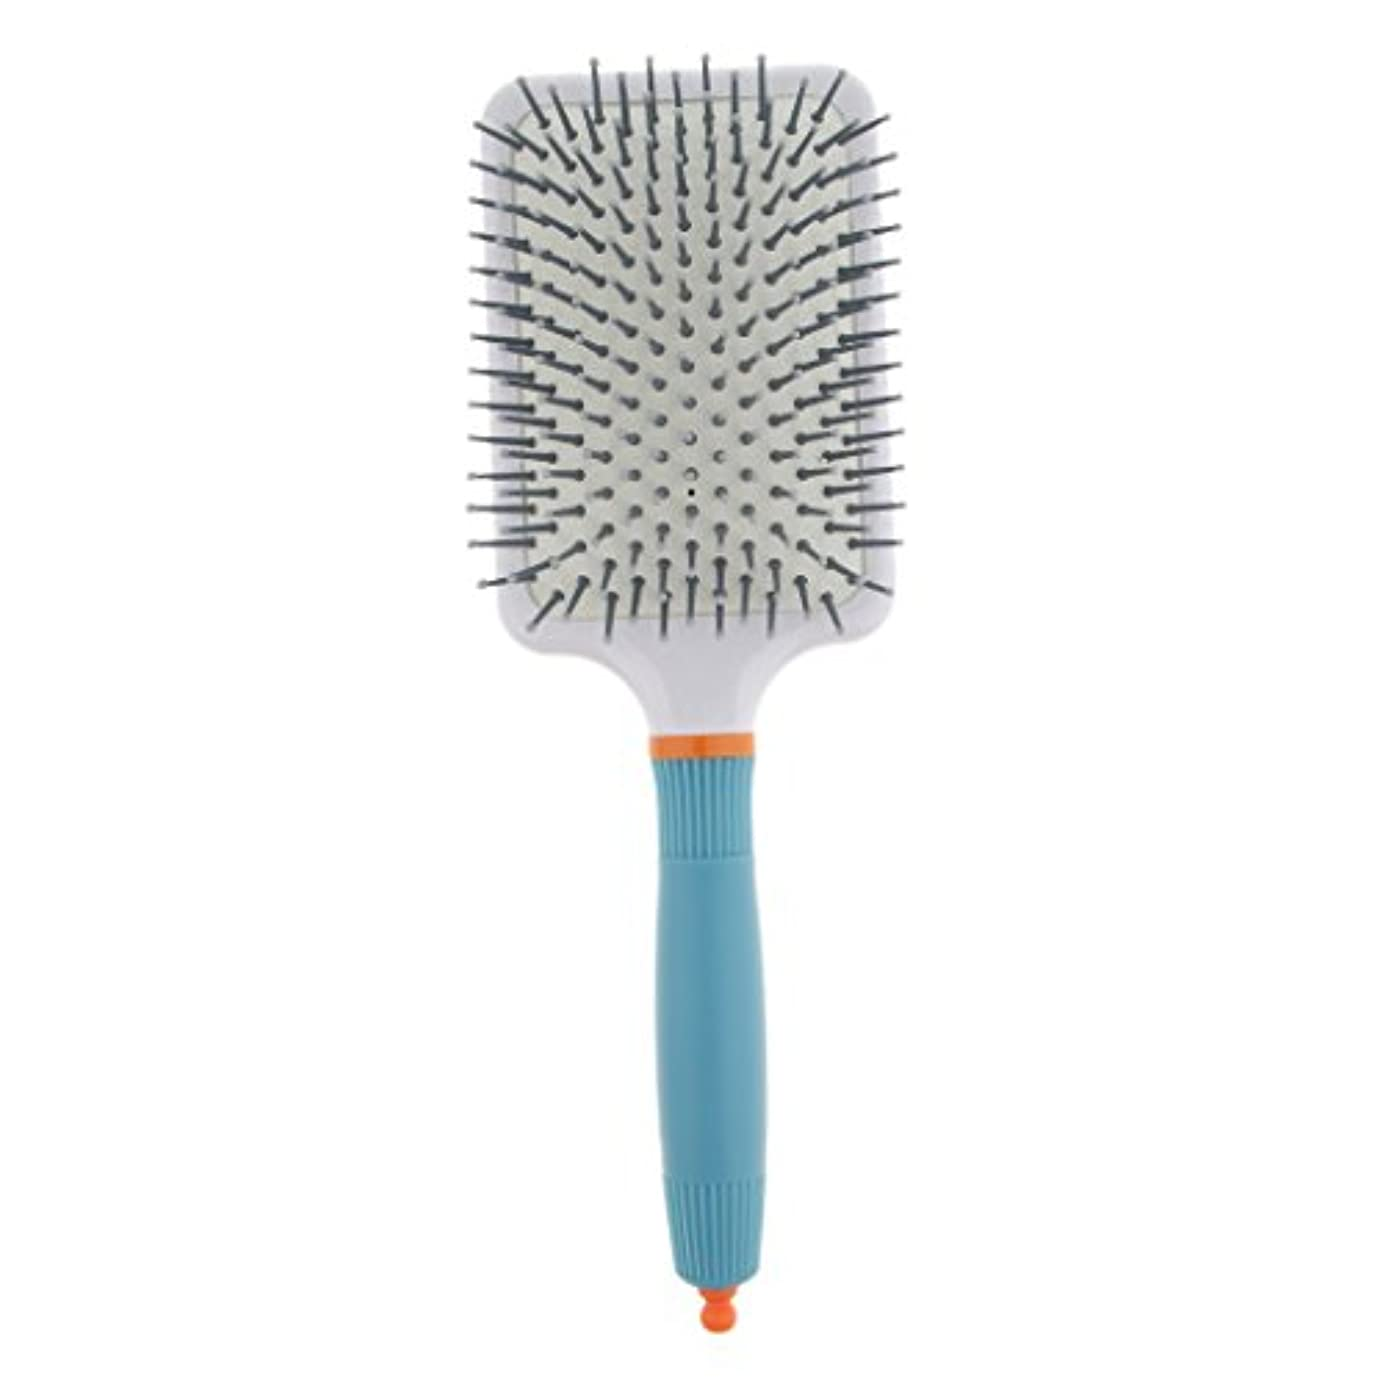 Fenteer 頭皮マッサージ ヘアブラシ 櫛 パドル エアクッション櫛 2色選べる - ライトブルー